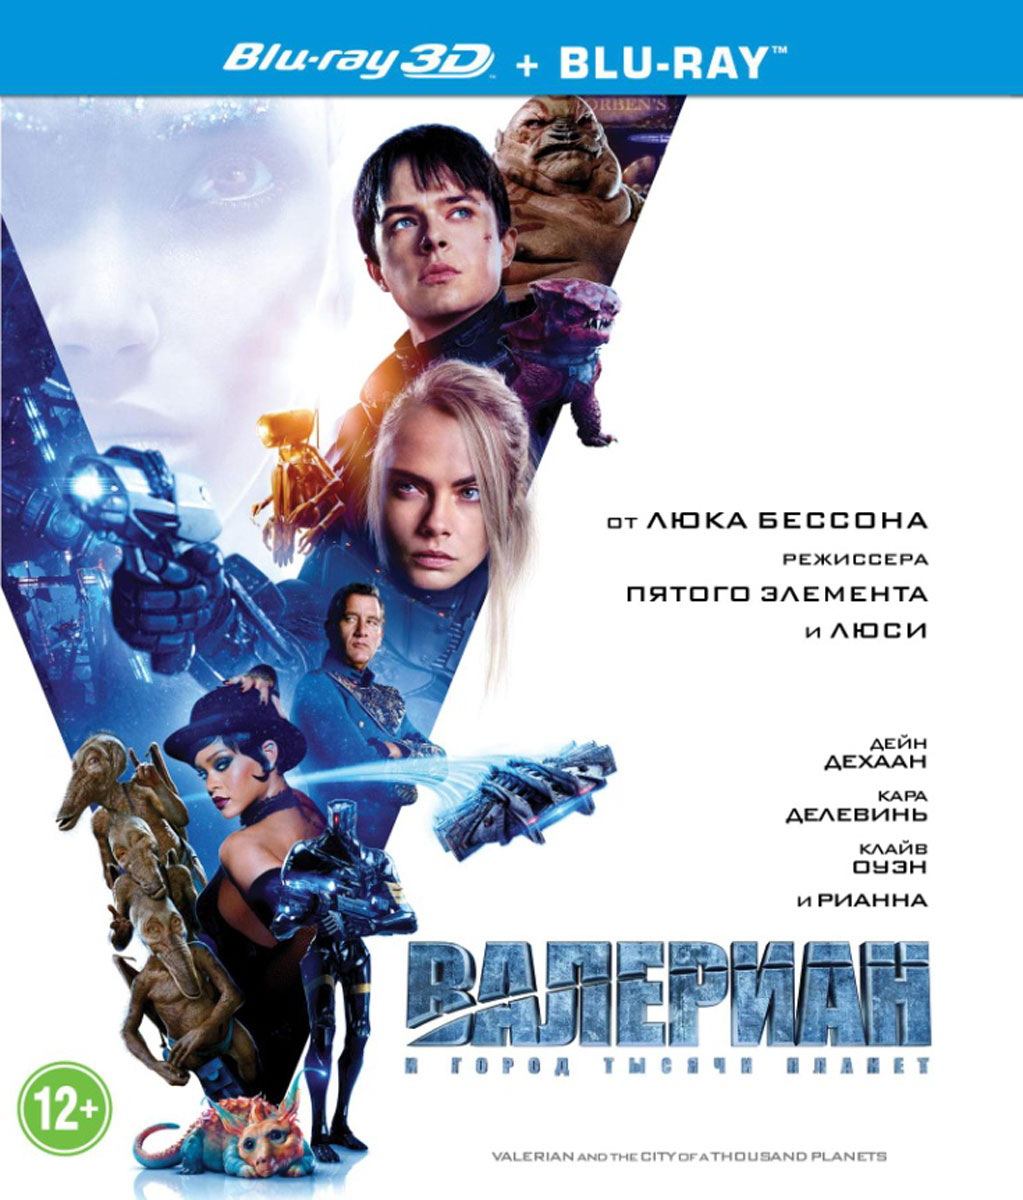 Валериан и город тысячи планет 3D (Blu-ray) europa европа фотографии жорди бернадо